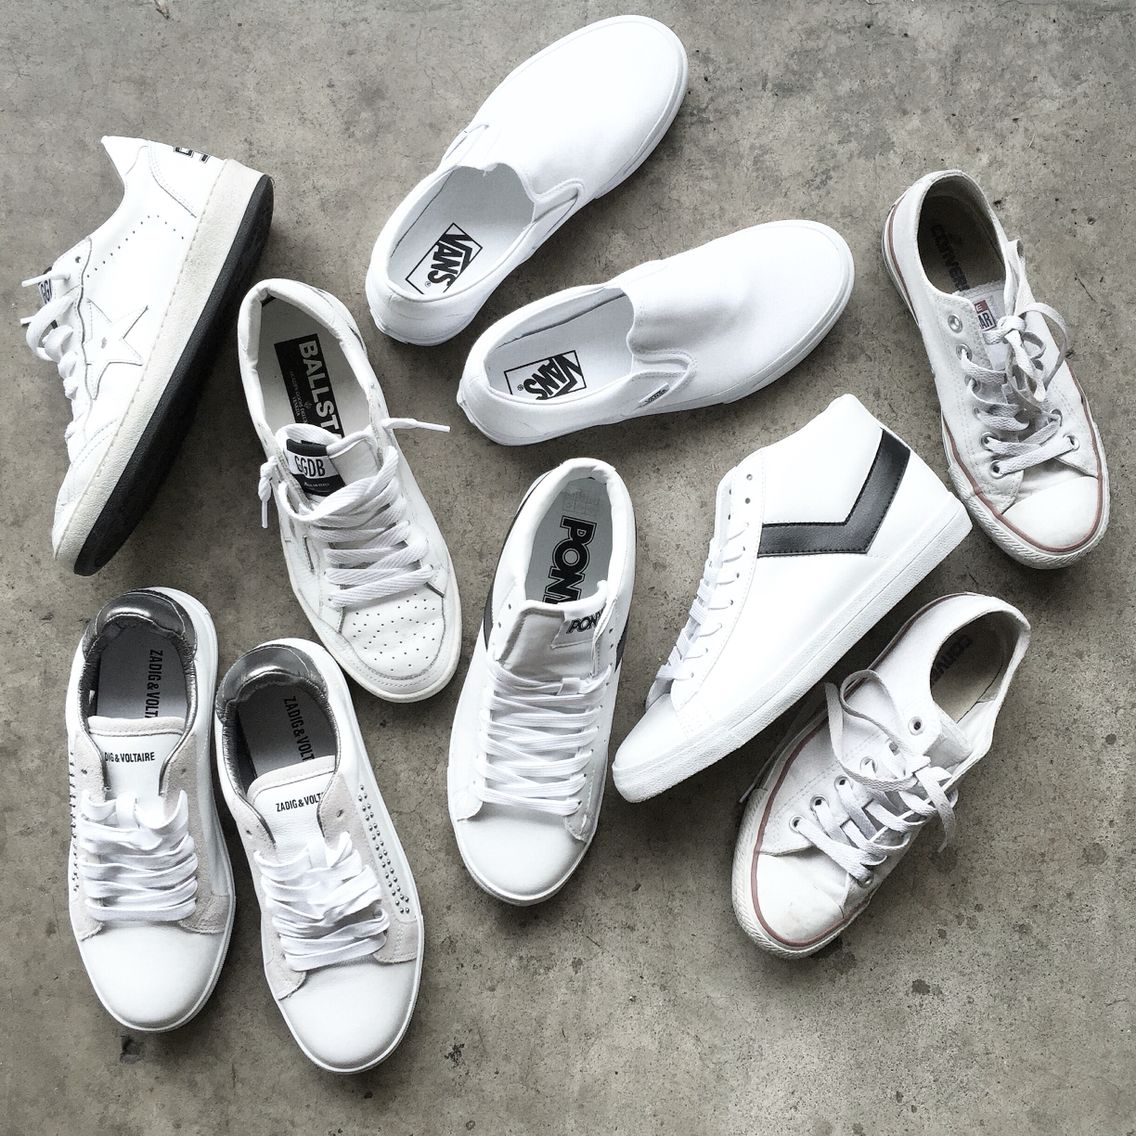 759bece0e0 White sneakers.  flatlay via OVRSLO